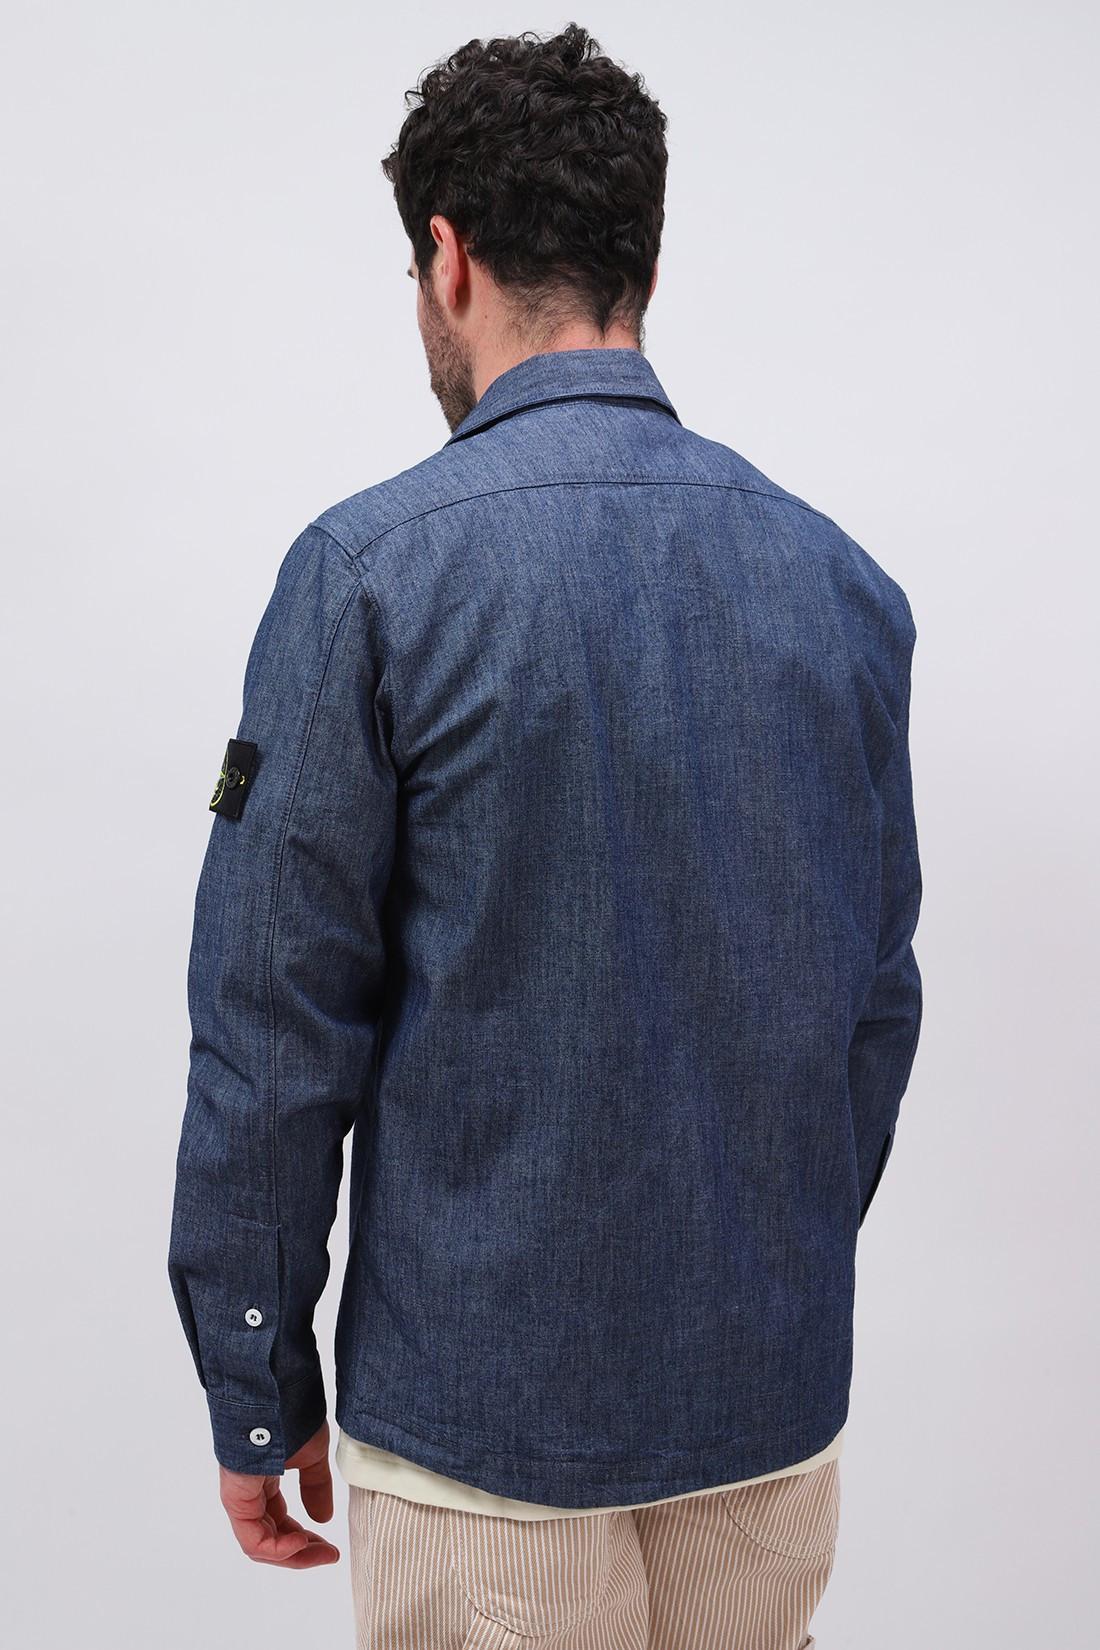 STONE ISLAND / 12207 chambray shirt Wash